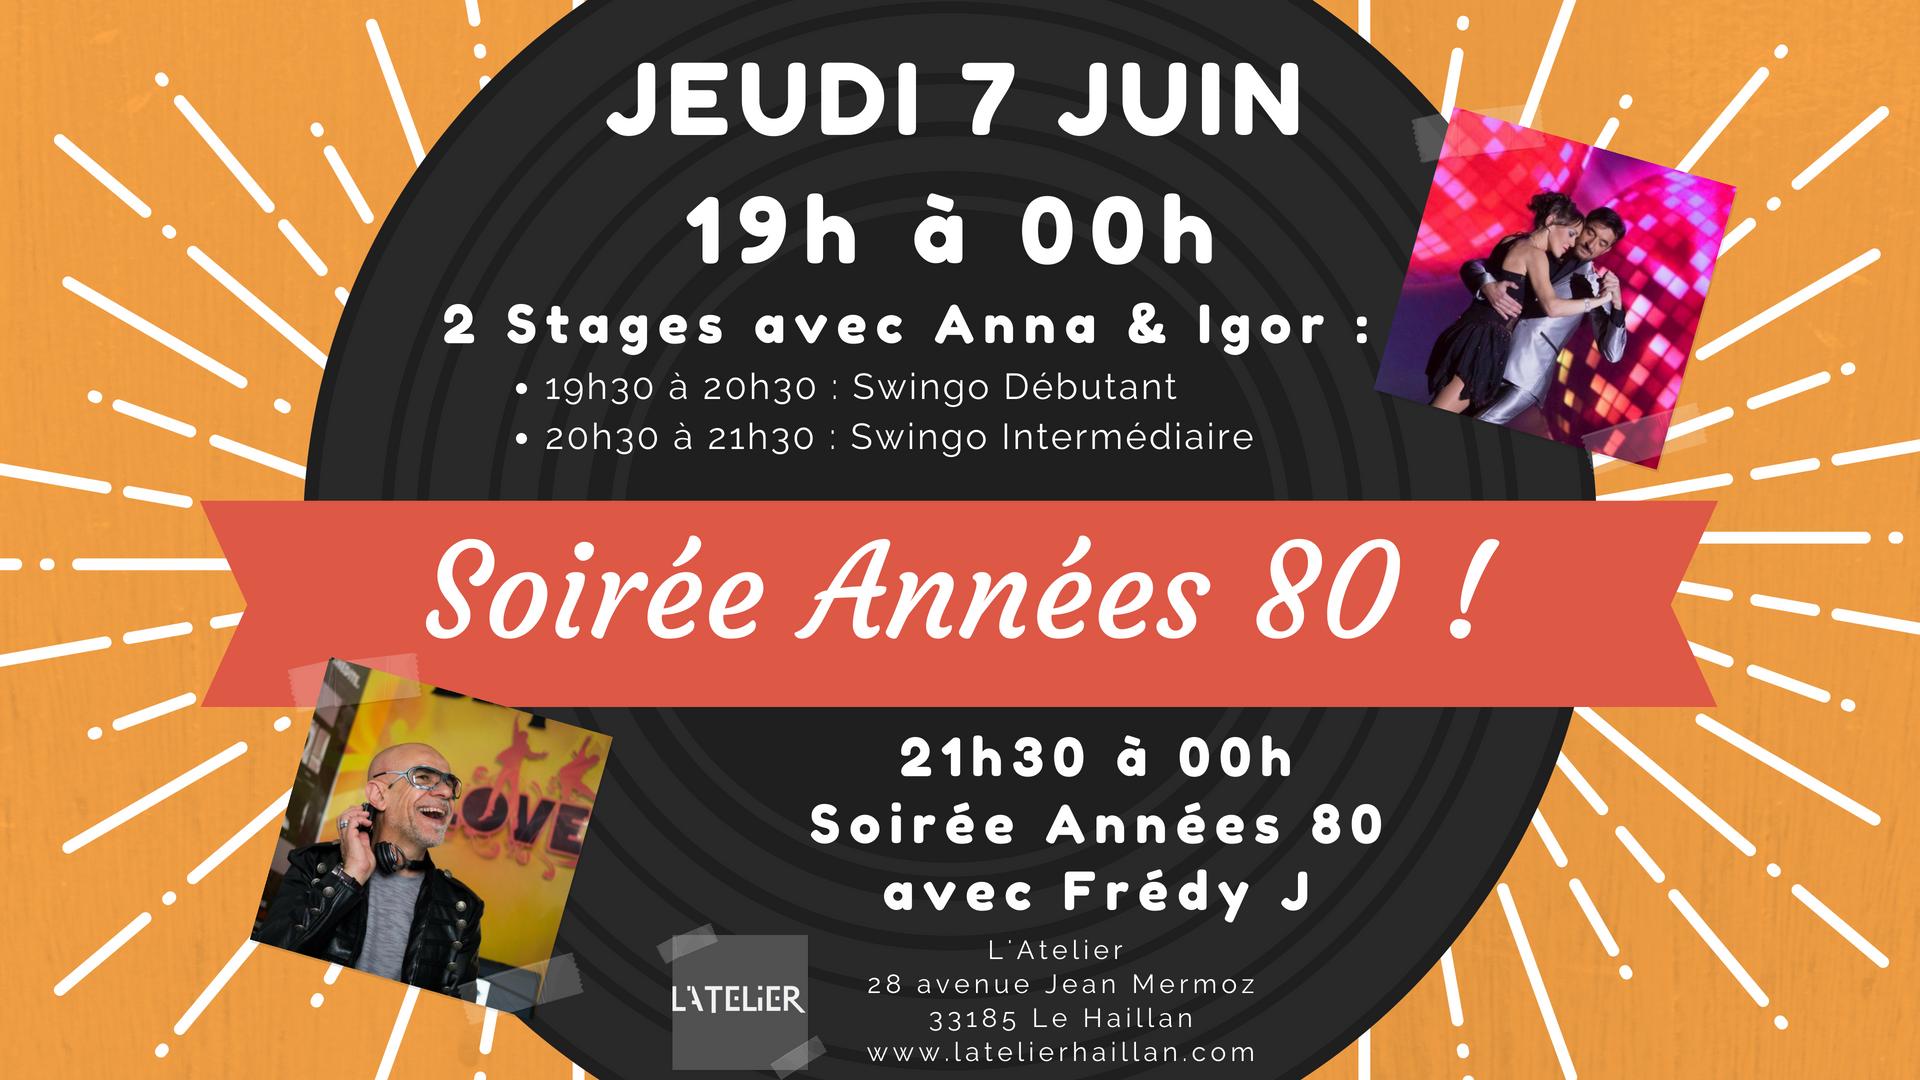 Soirée Années 80's avec Frédy J - 2 Stages Swingo avec Anna & Igor